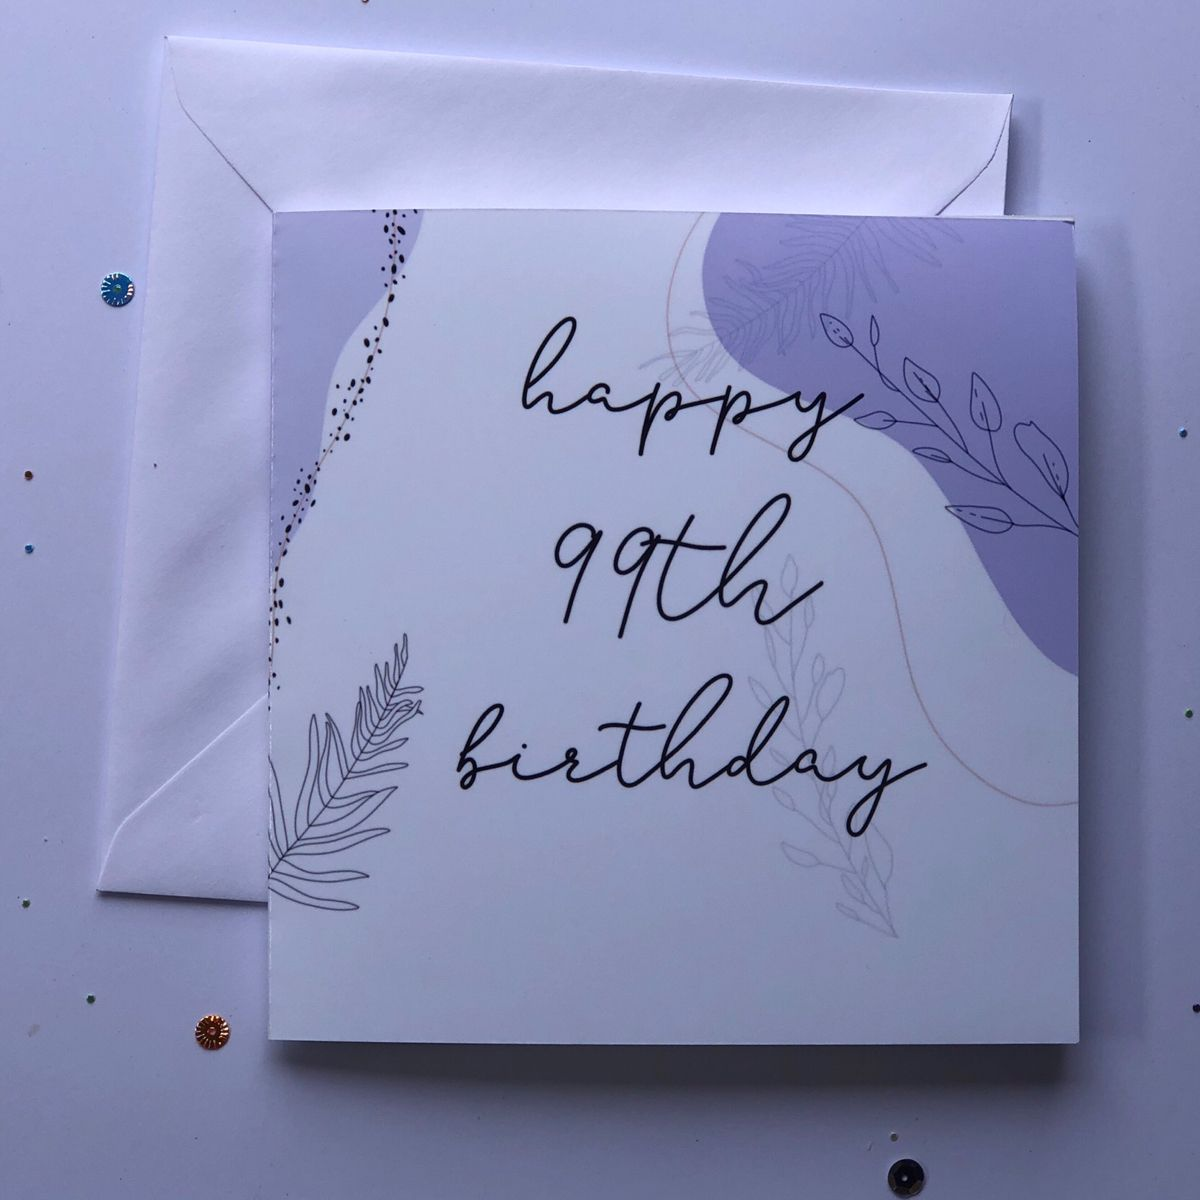 Happy 99th Birthday Happy Birthday Birthday Card Card Happy Birthday Card Etsy Floral Cards Design Happy Birthday Cards Happy Birthday Card Design